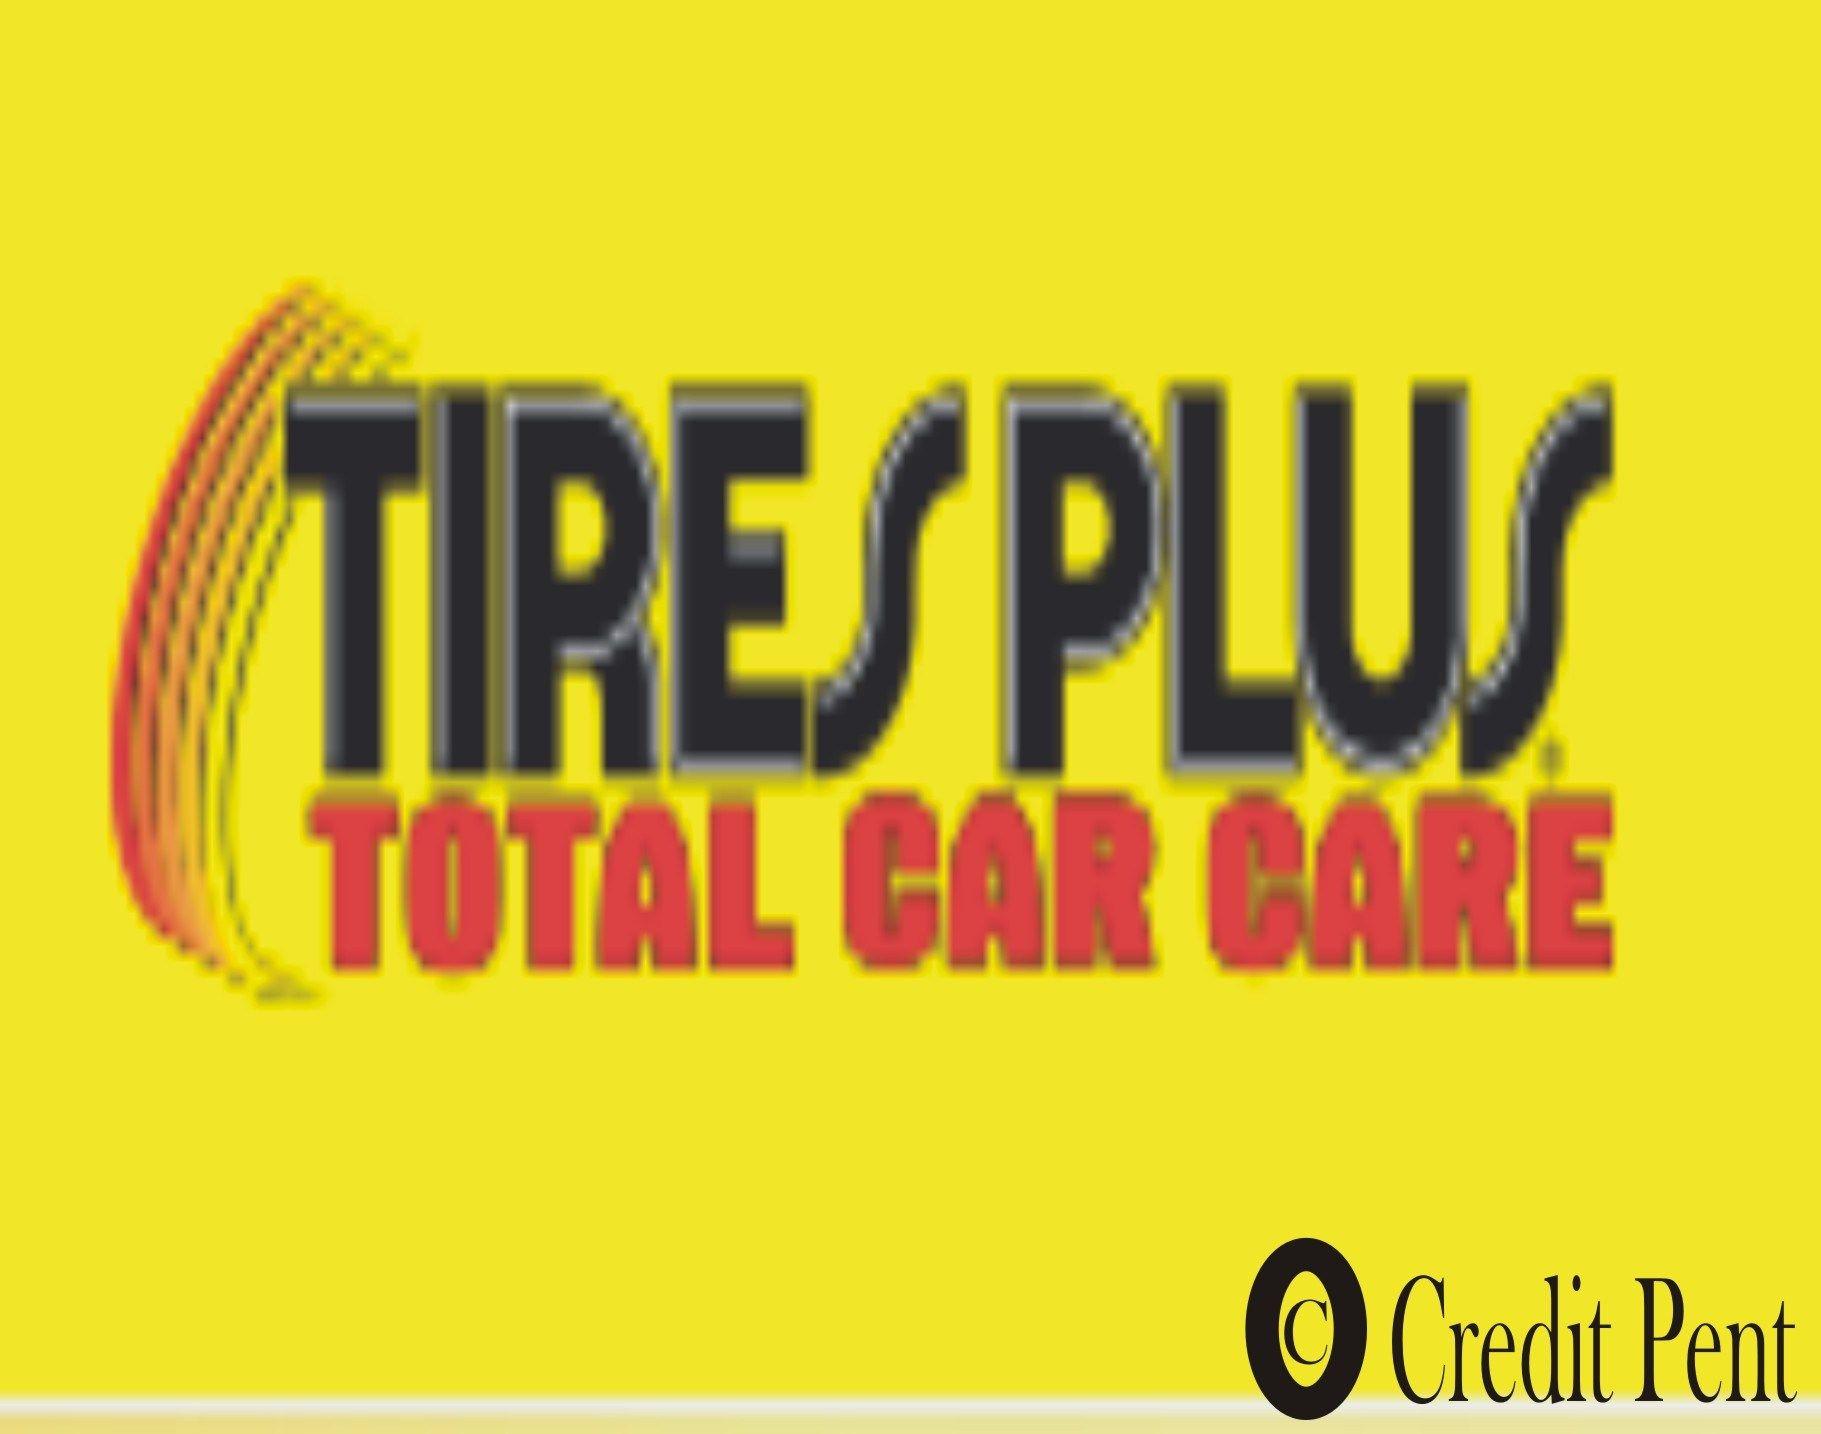 Hibdon Tires Credit Card Applycard Co